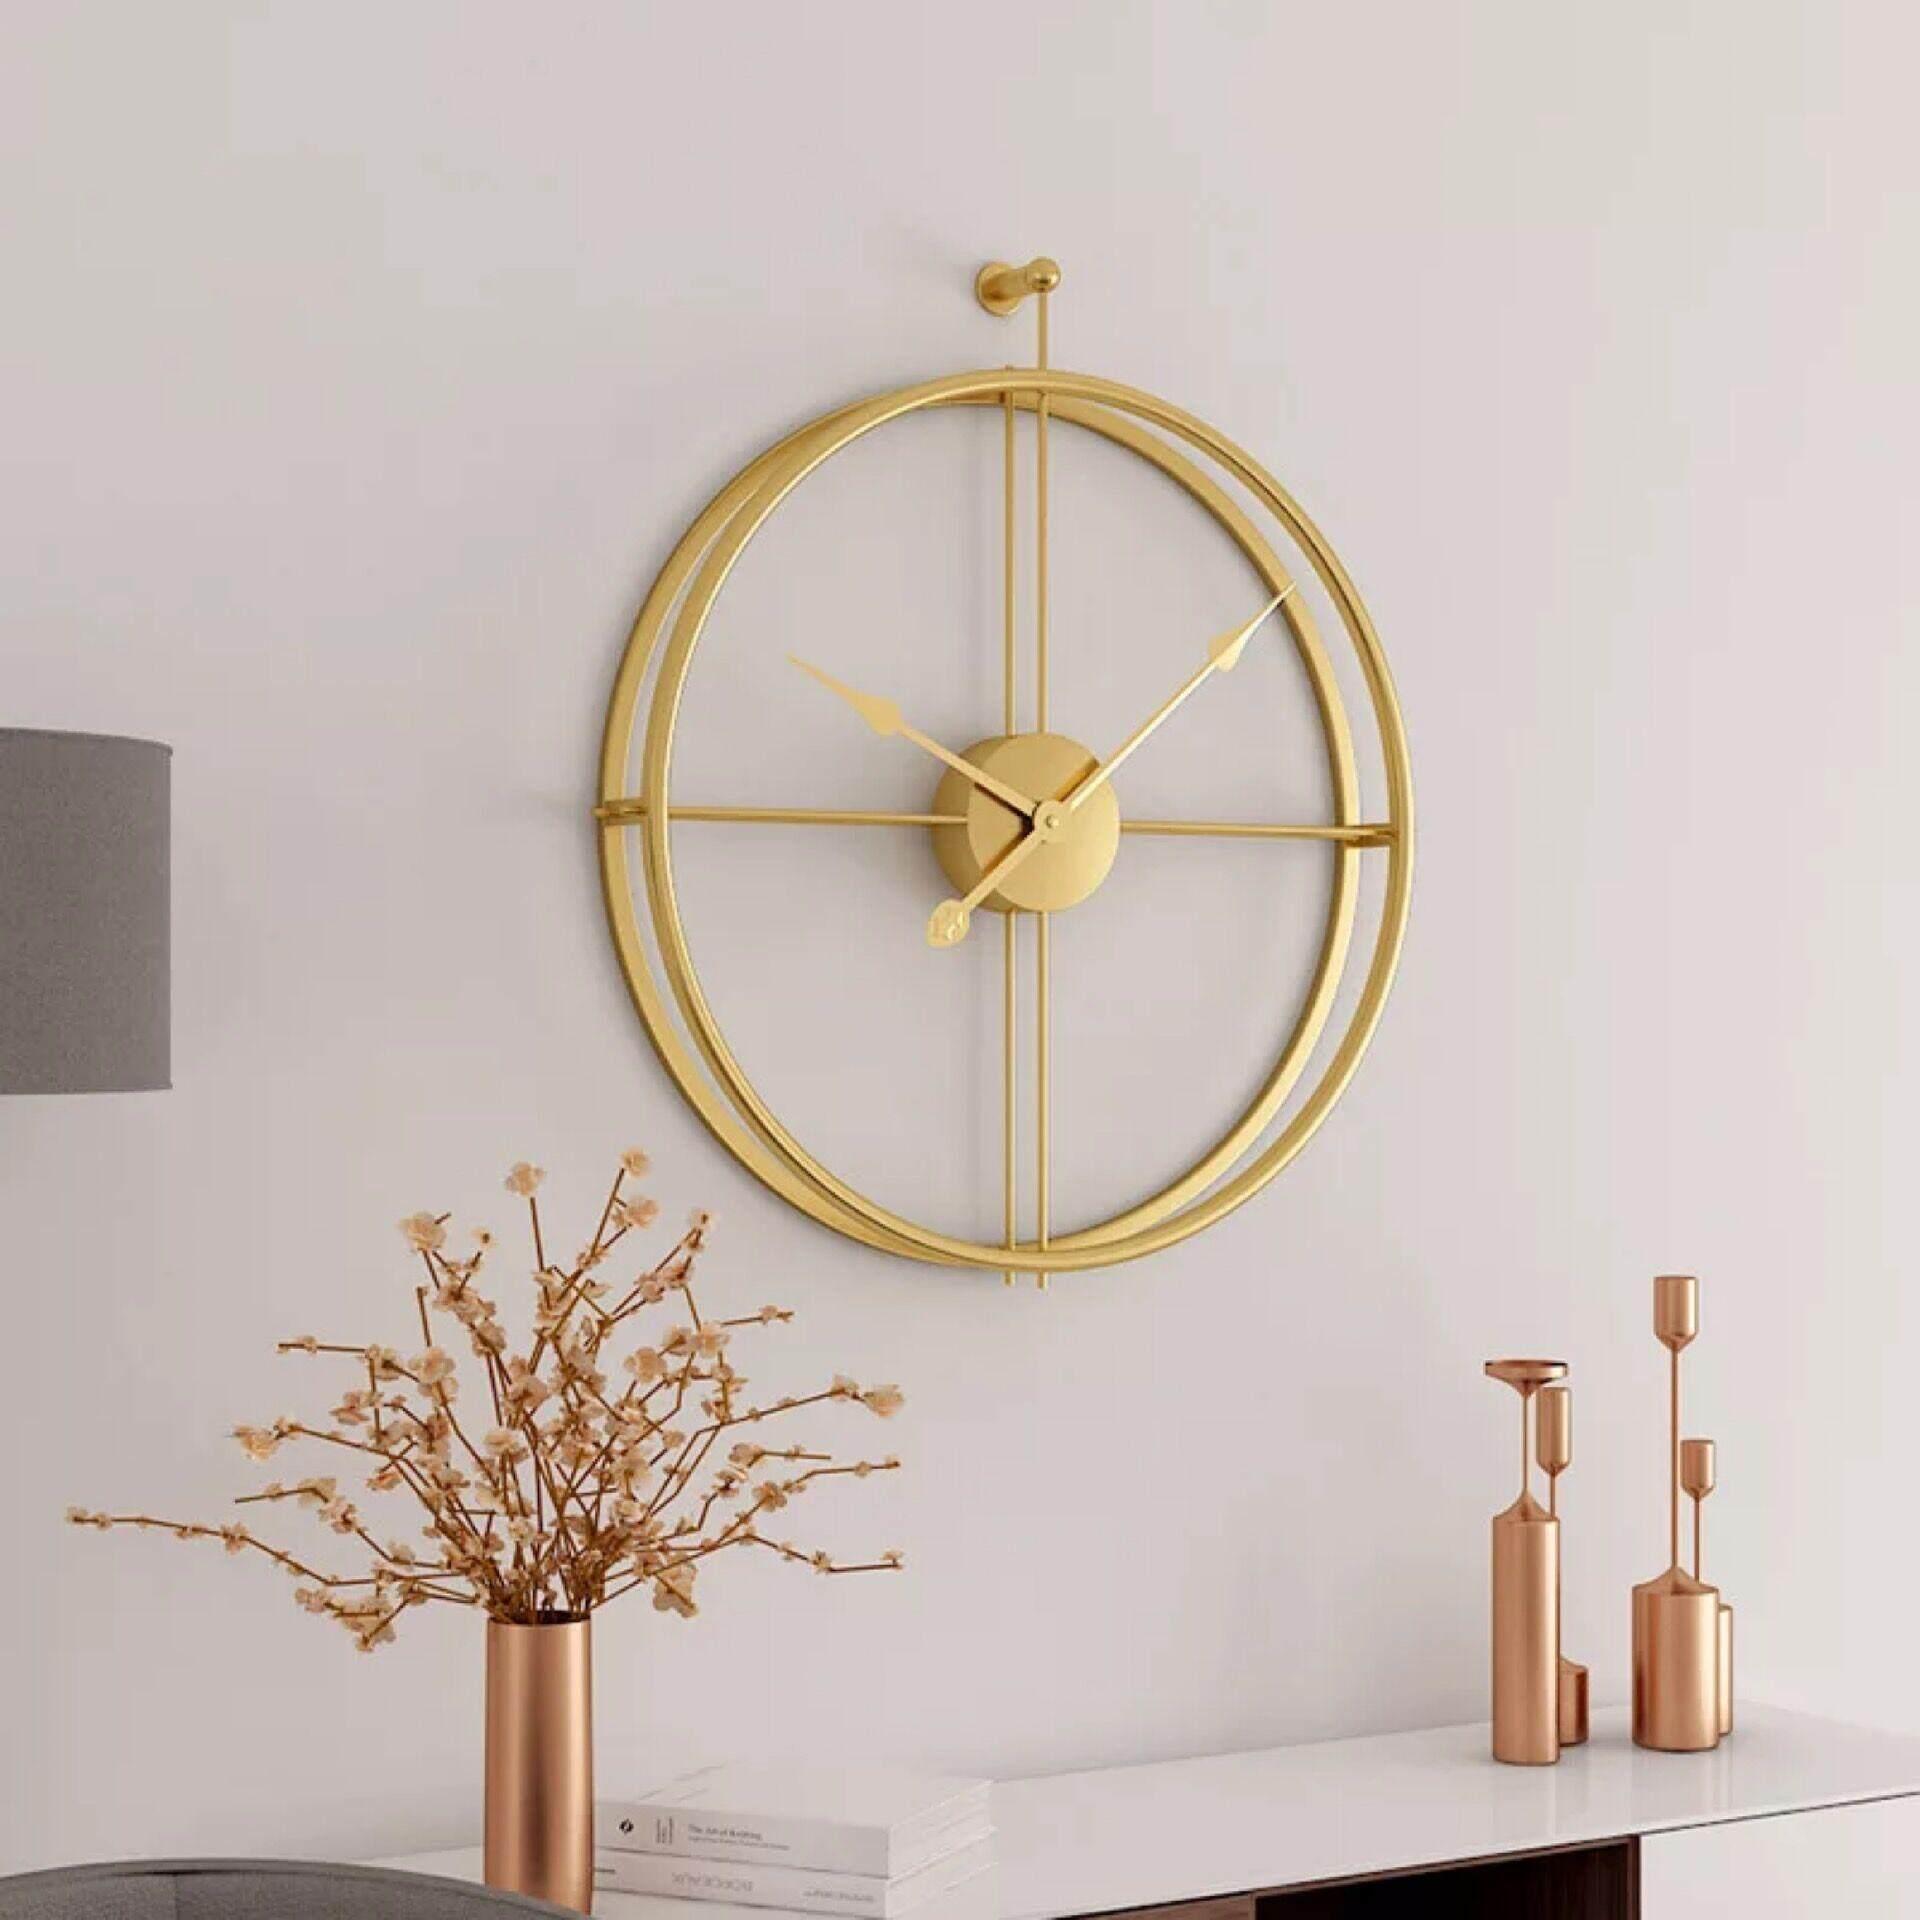 Large Nordic Style Creative Fashion Iron Wall Clock Modern Design Mute Clocks for Home Decor Office Hanging Wall Watch Clocks 59x52cm